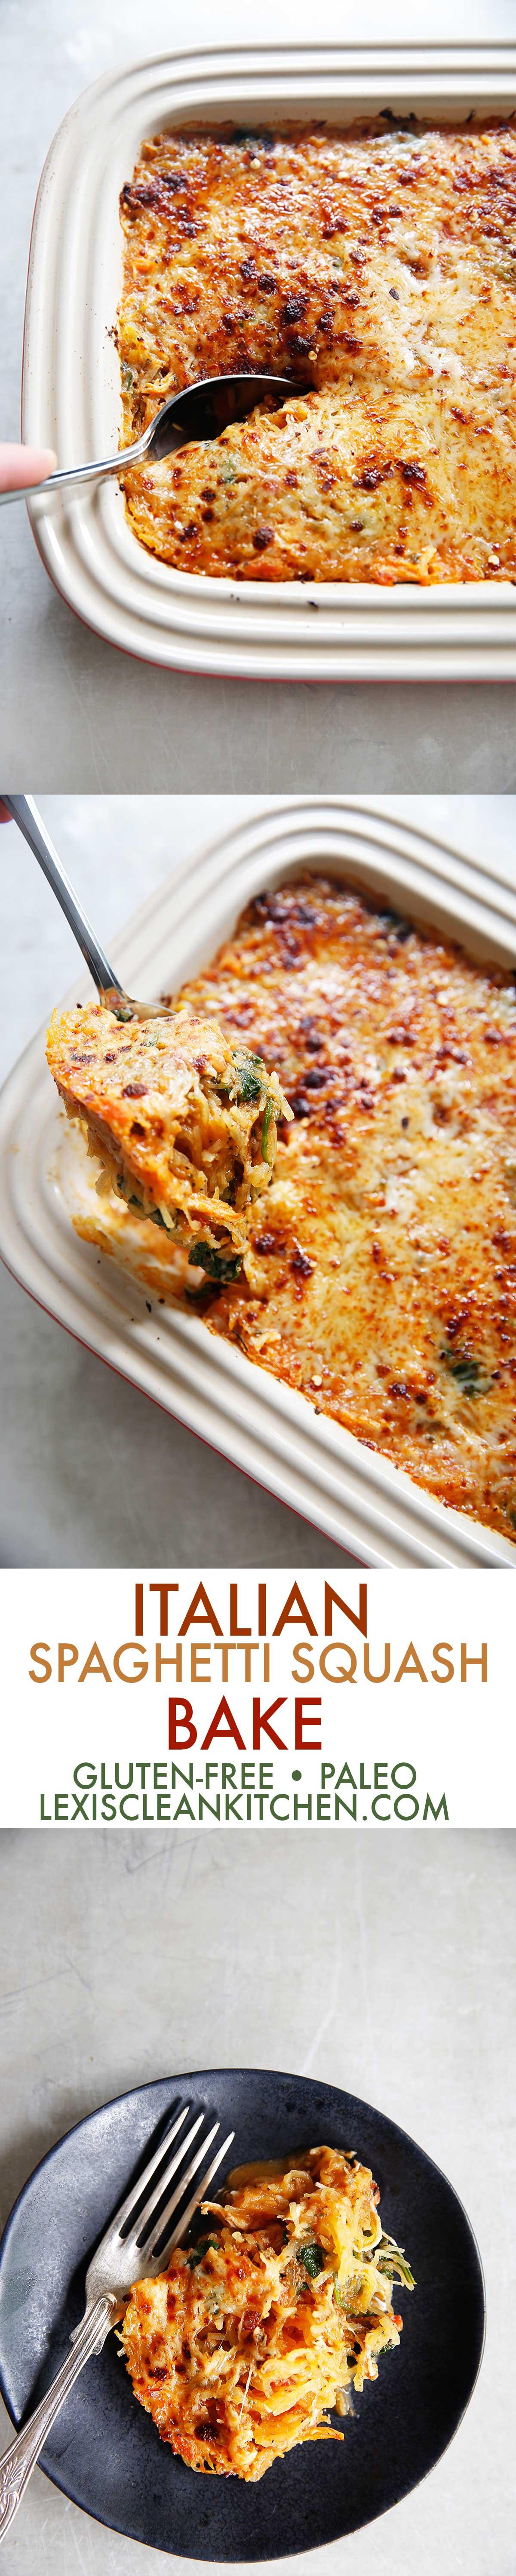 Italian Spaghetti Squash Bake | Lexi's Clean Kitchen